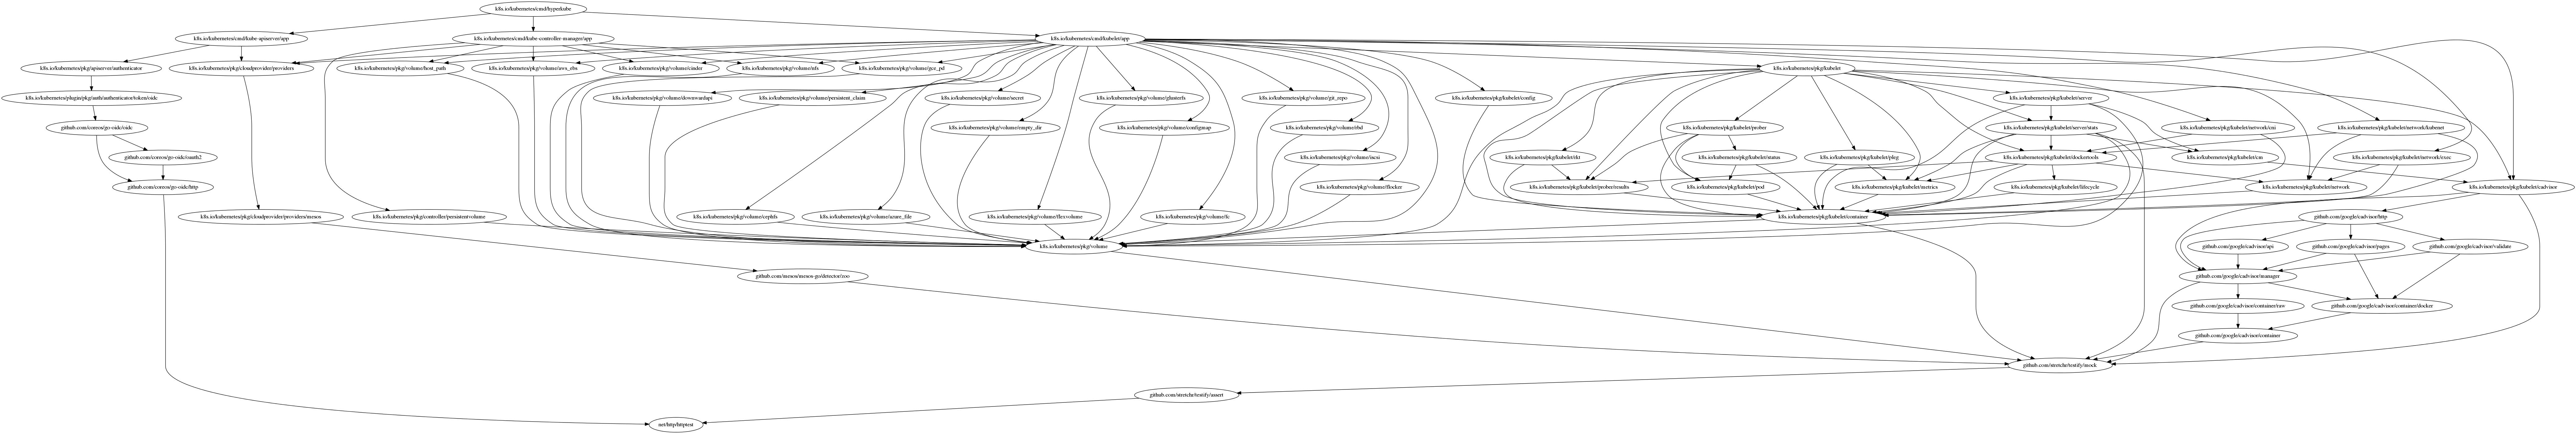 godepq生成import包树图